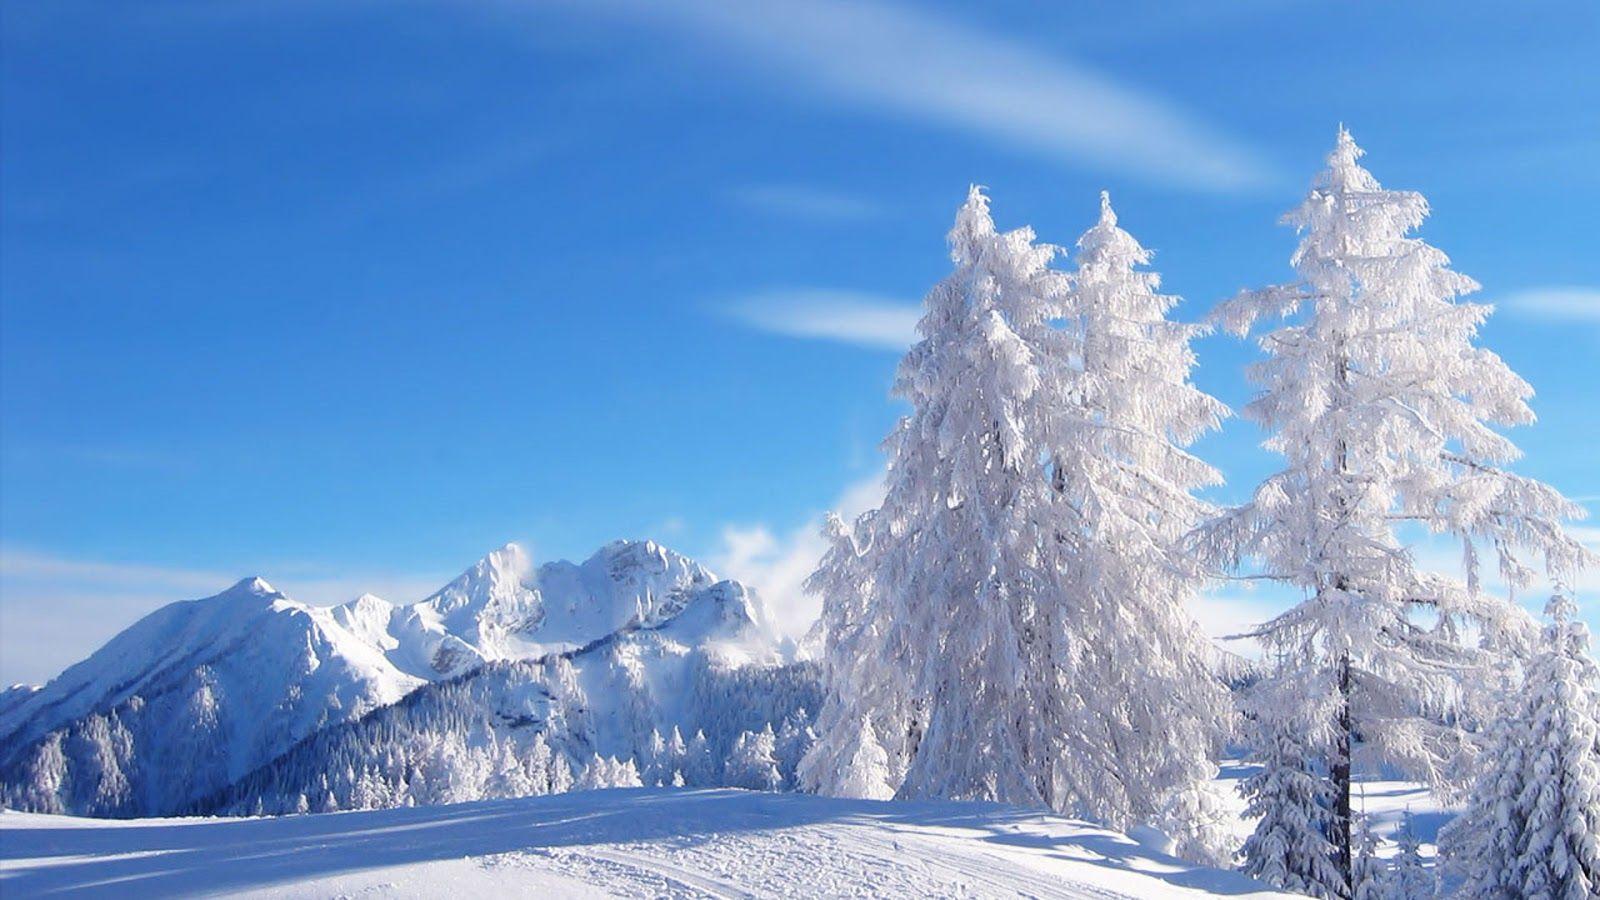 Winter Season Winter Season Snow Cold Christmas See More Https Www Facebook Com Chris Wysocki1 Med Winter Landscape Winter Nature Winter Scenes